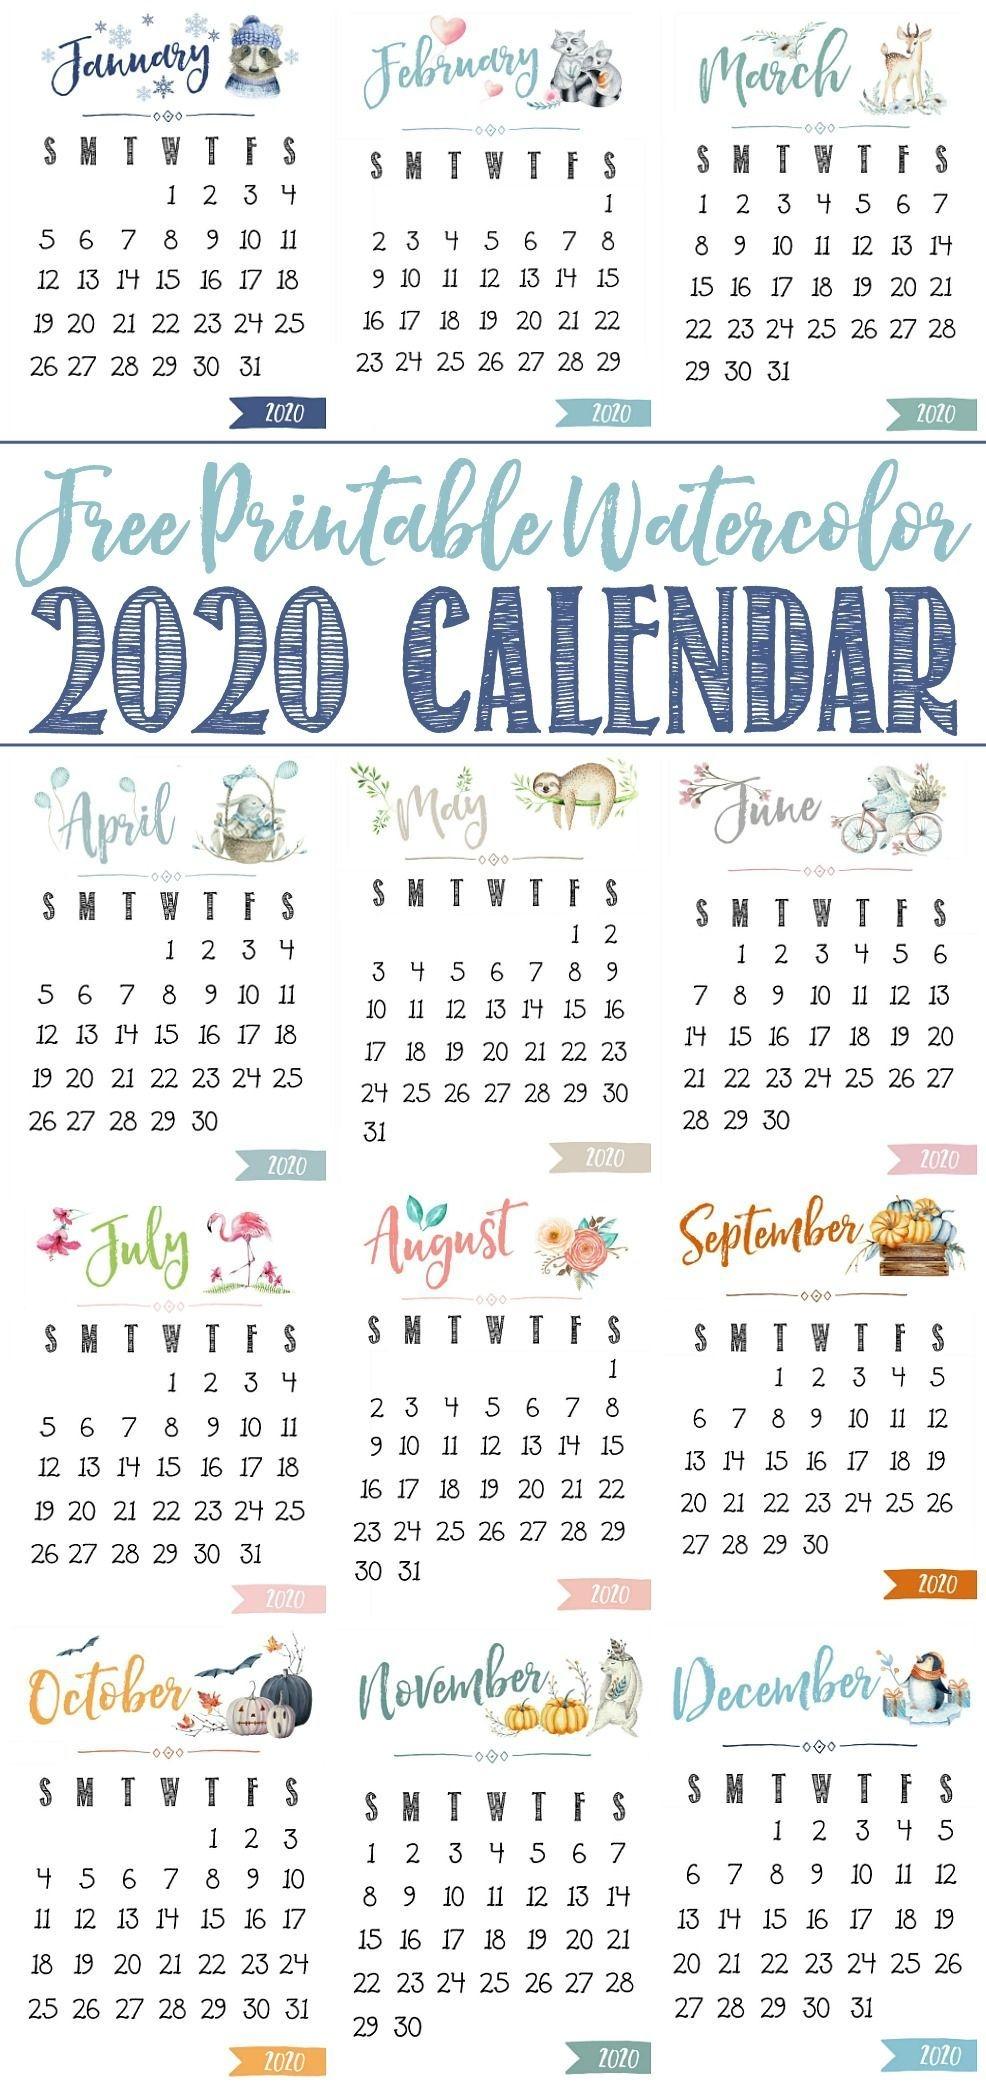 Free Printable 2020 Calendar   Free Printable Calendar